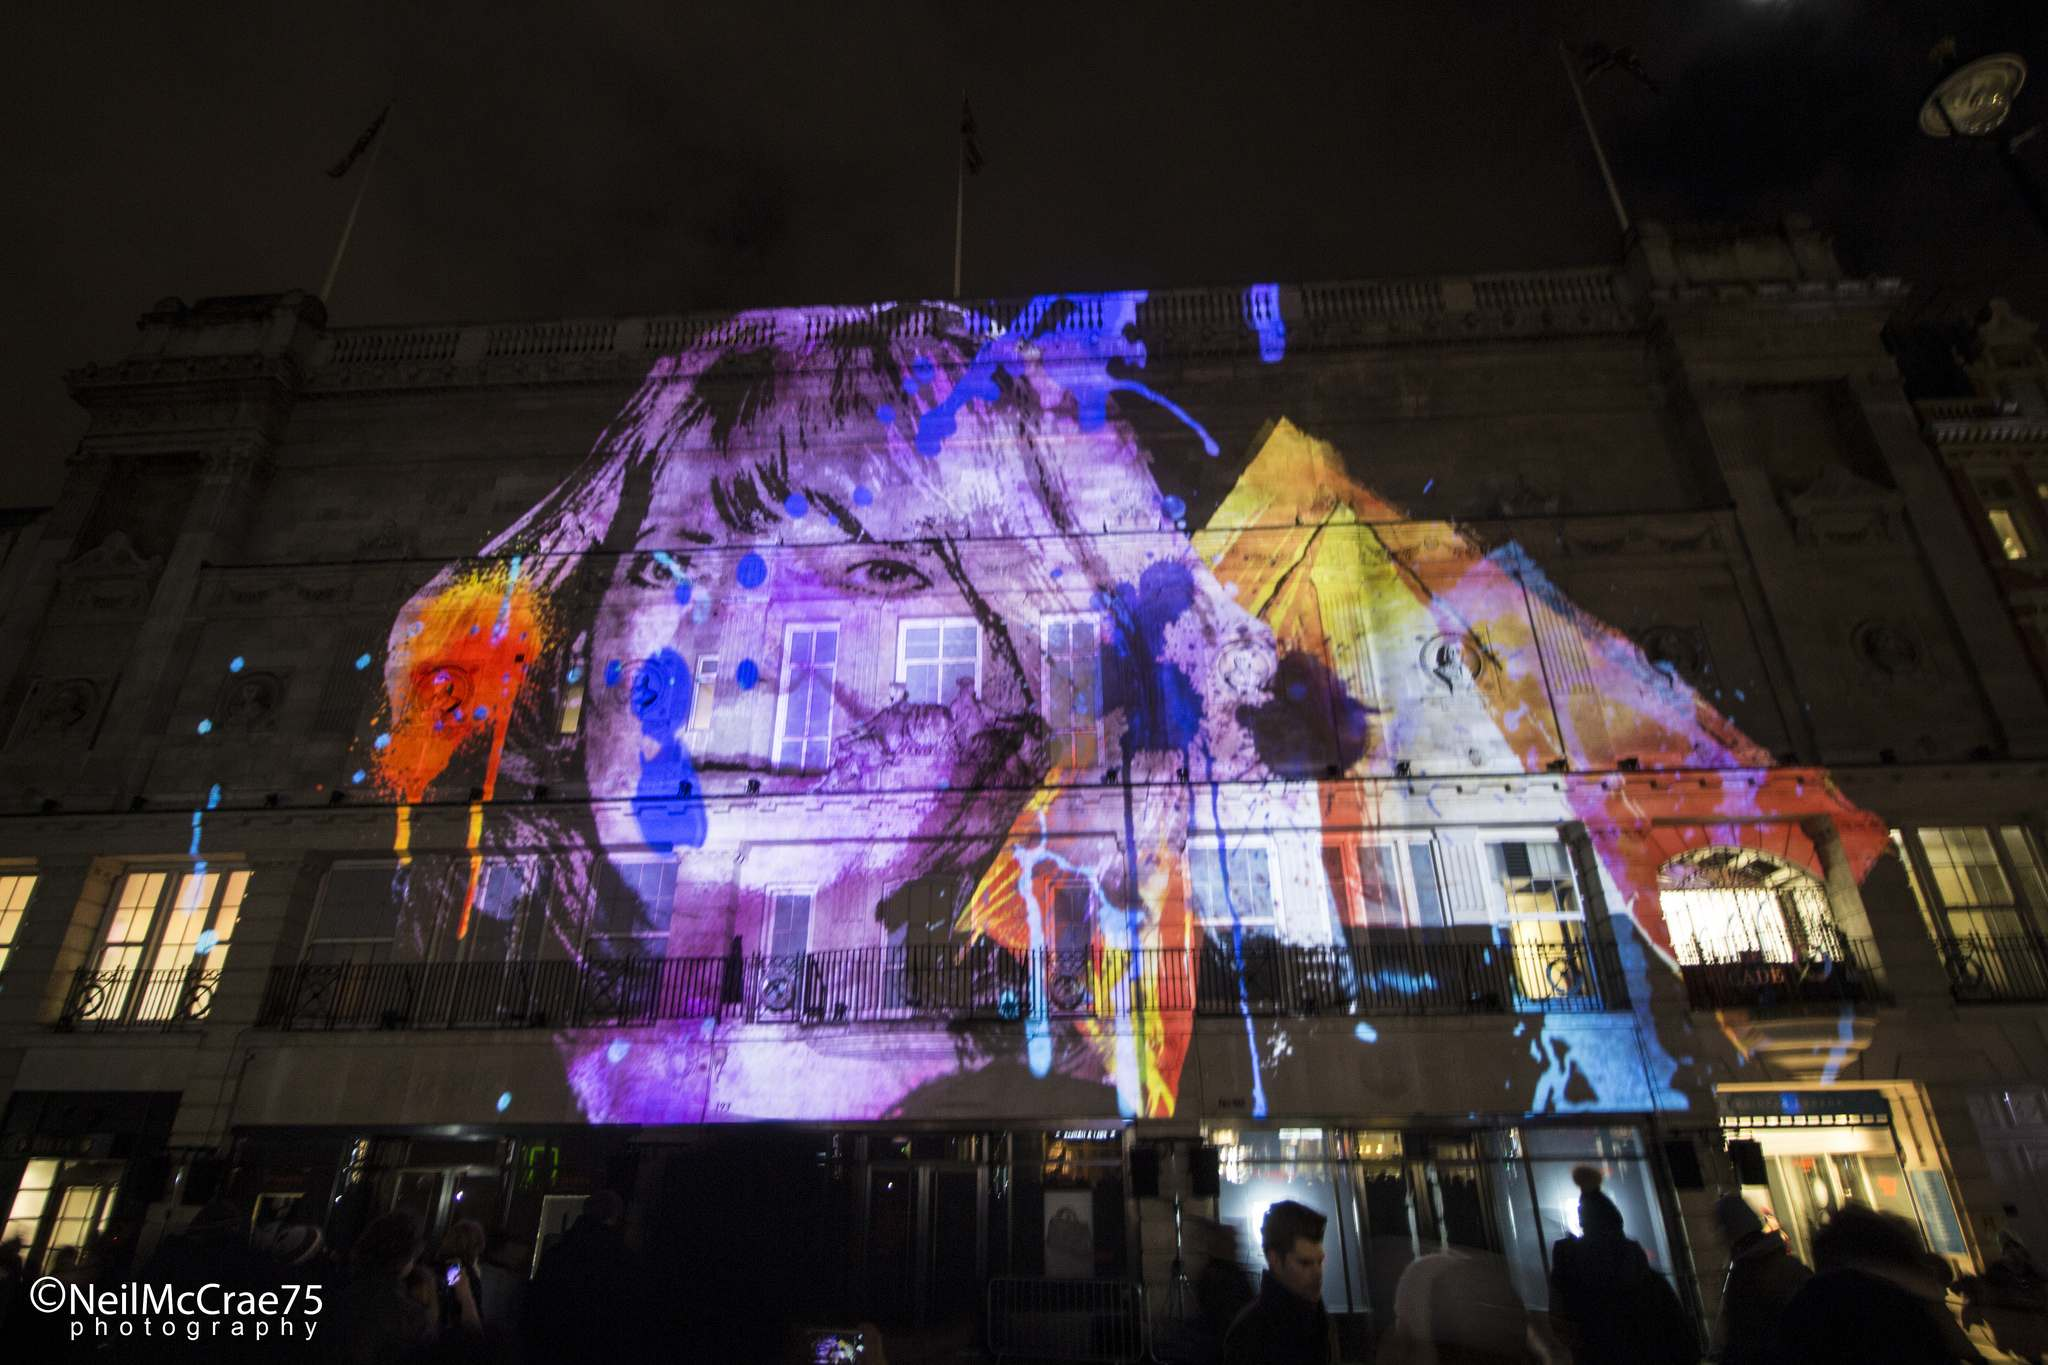 london lumiere festival10 The London Light Lumiere Festival by Neil McCrae